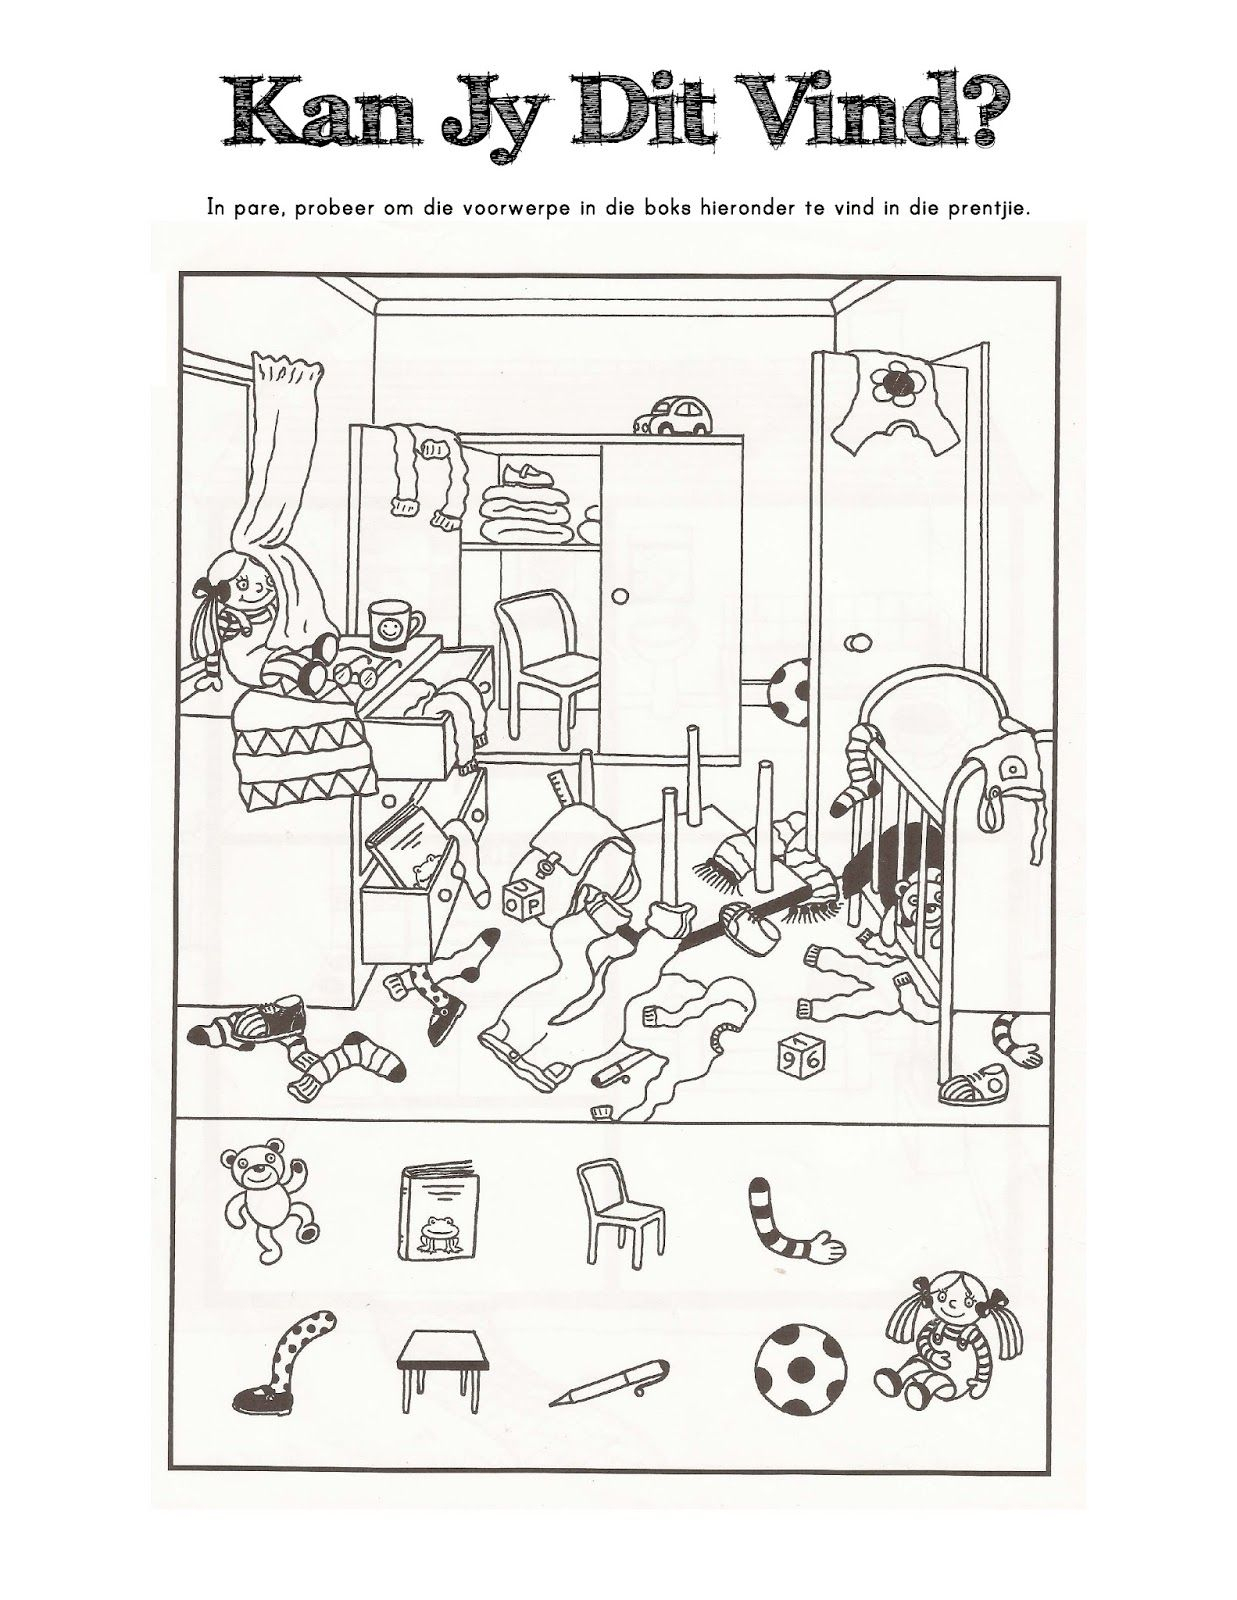 Printable Crossword Puzzles In Afrikaans